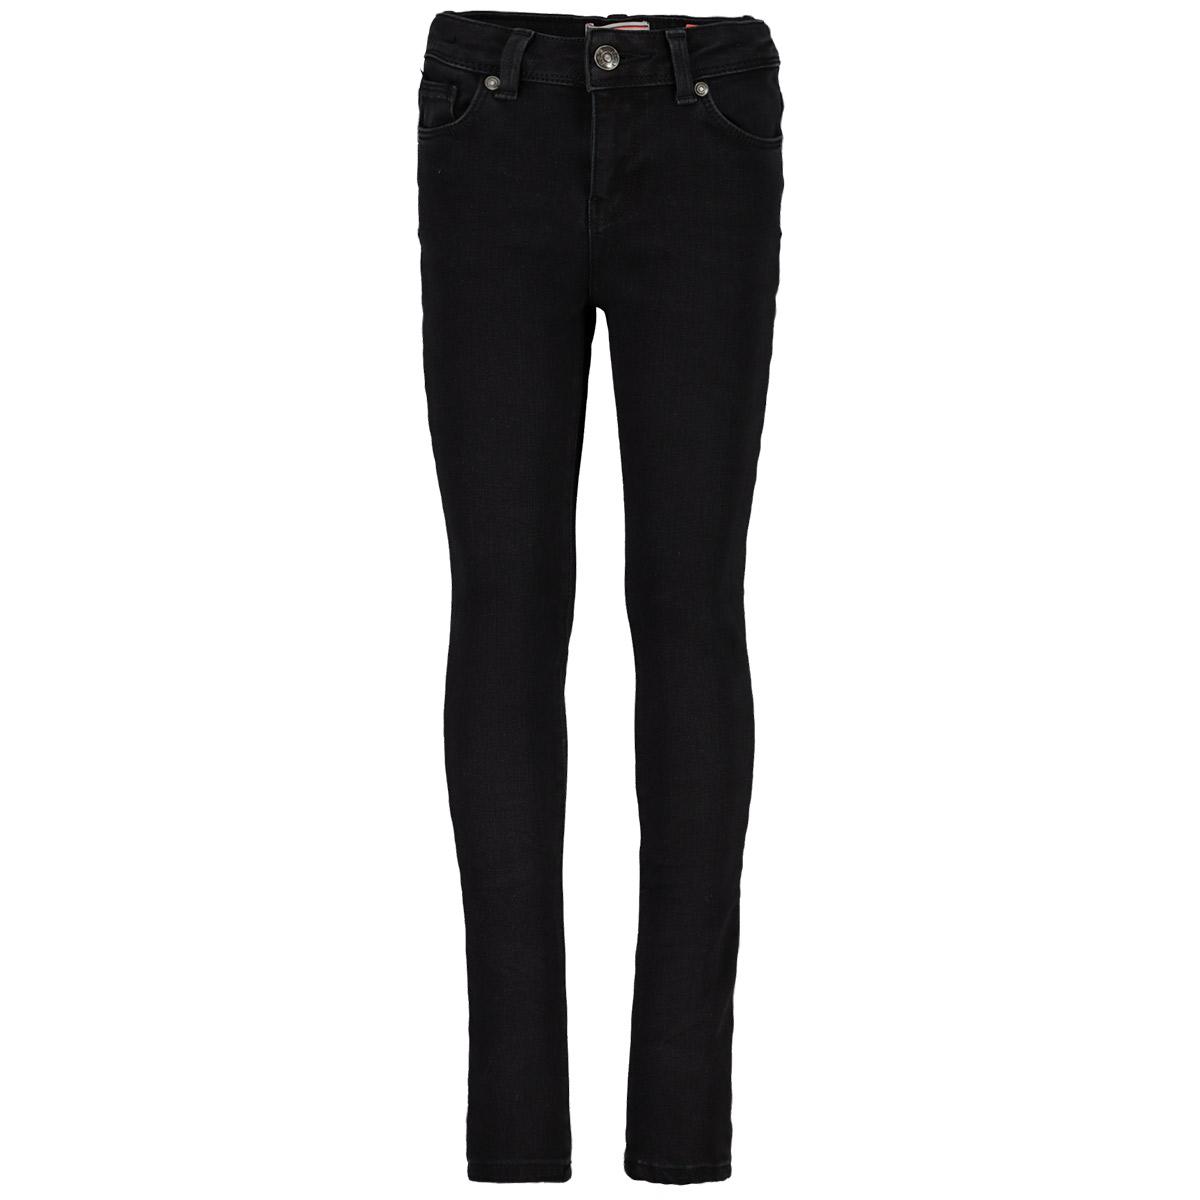 d9a2d938273cb9 Cars Jeans kinderkleding bestel je online bij